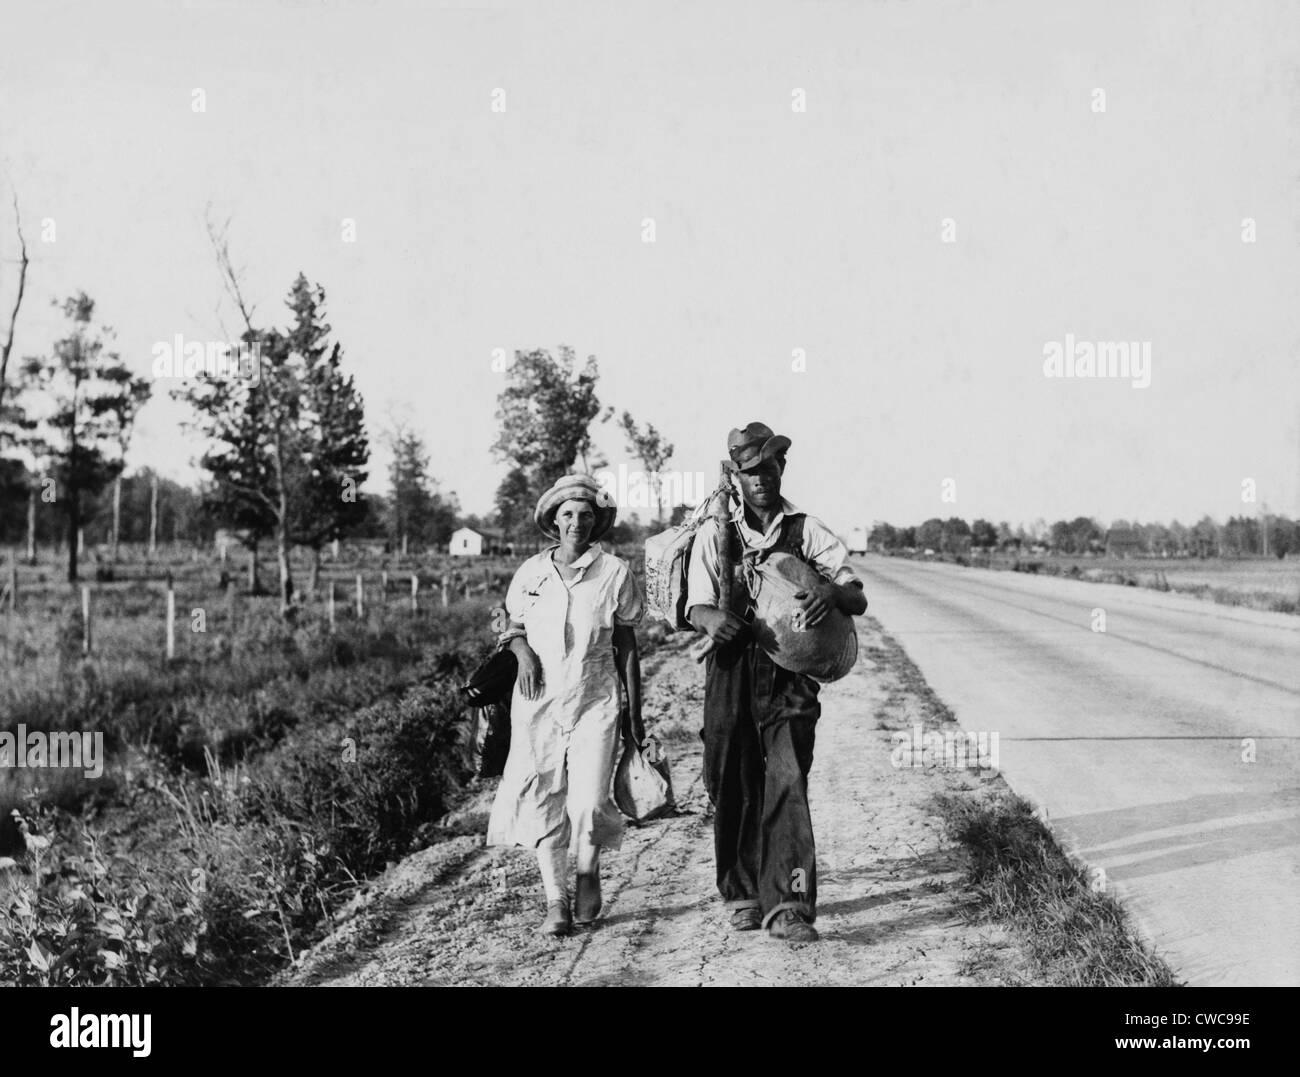 Homeless 1930s Stock Photos & Homeless 1930s Stock Images - Alamy